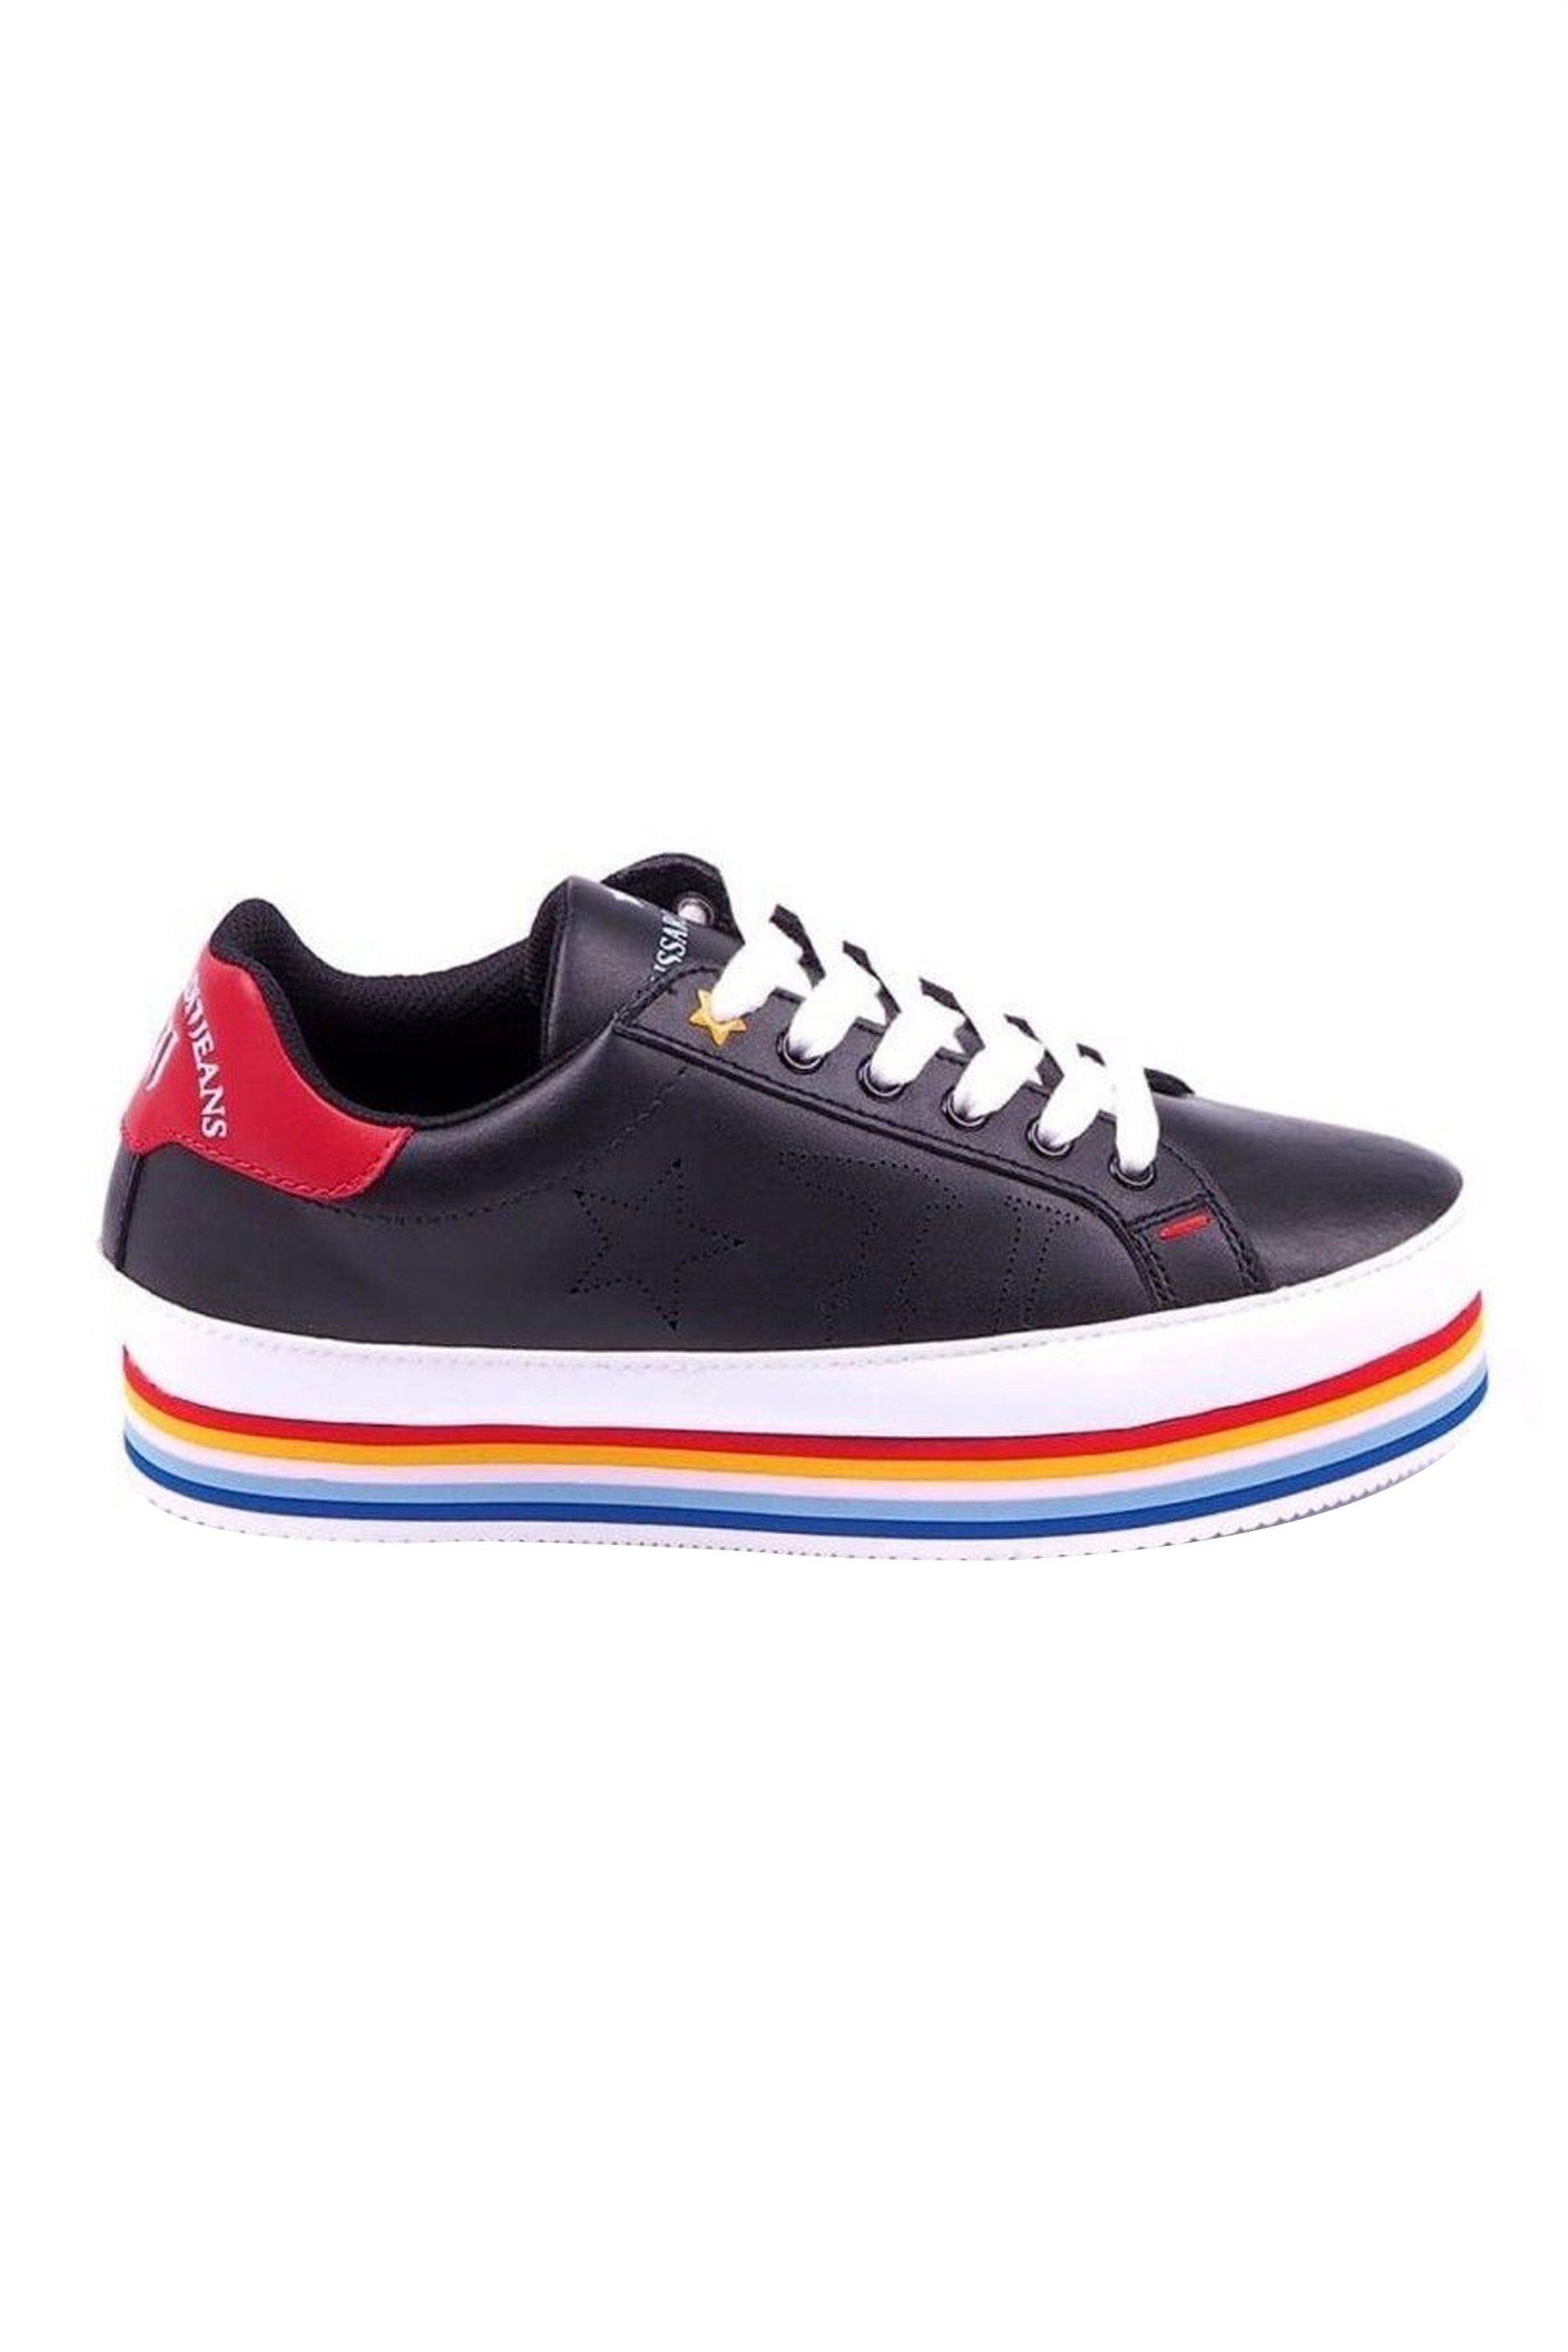 Trussardi γυναικεία chunky sneakers με υπερυψωμένη σόλα – 79A00129-9Y099999 – Μαυρο